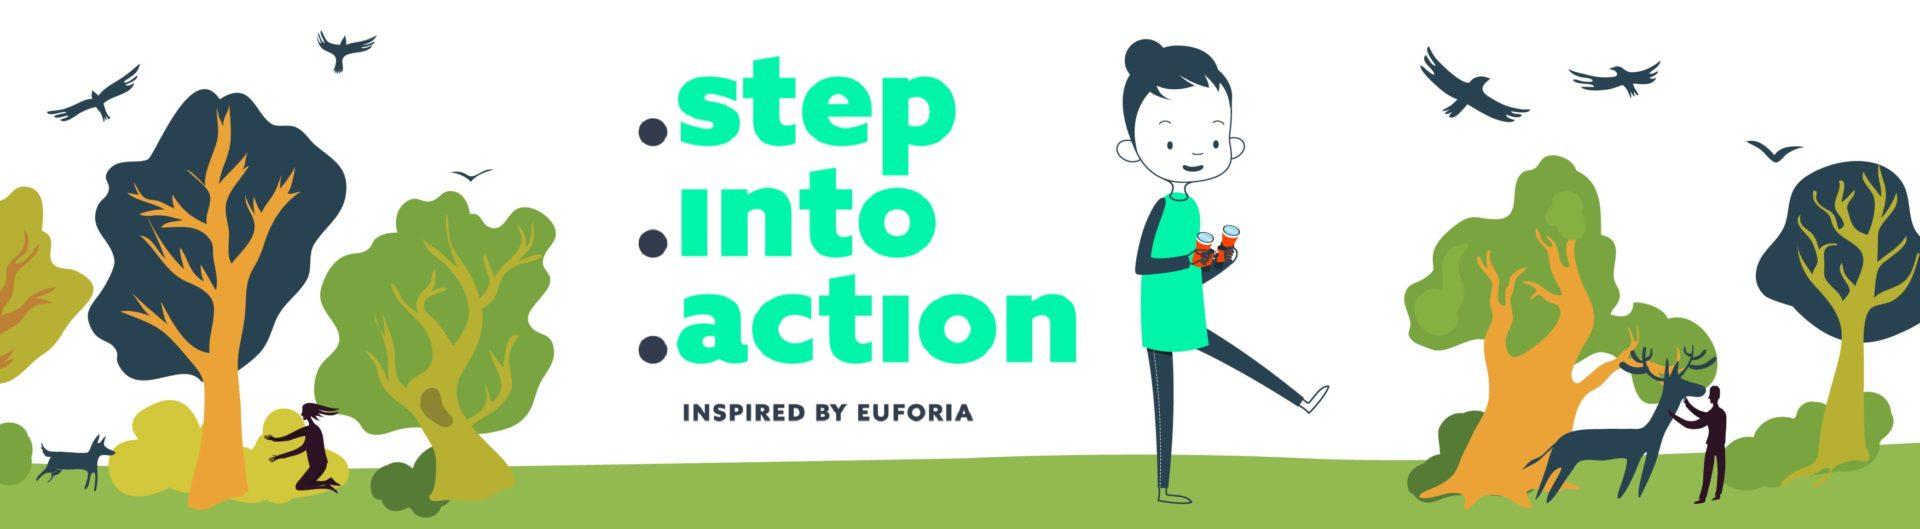 step into action motion design association